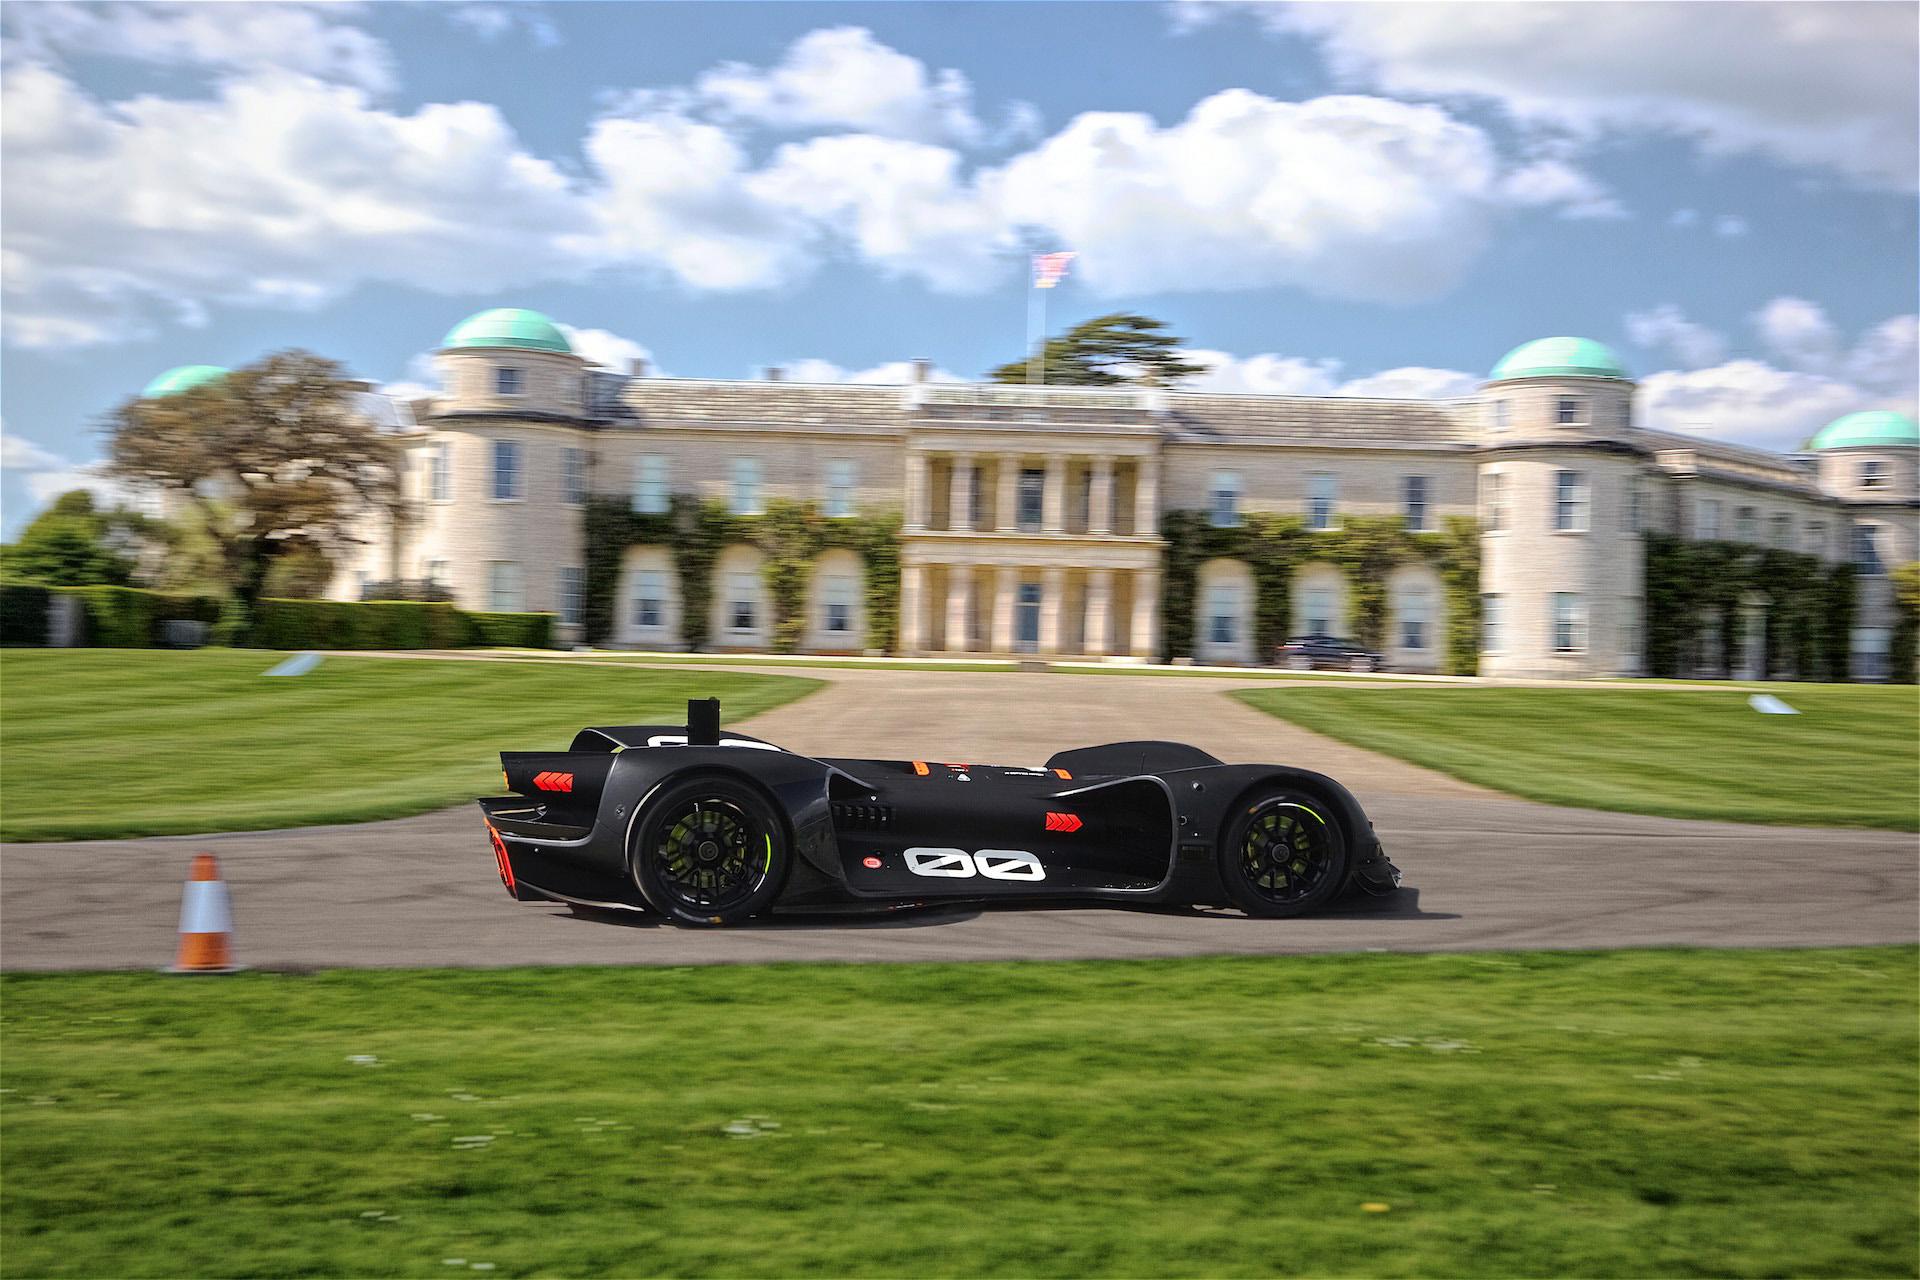 Enjoy This Degree Video Of Roboraces Autonomous Run Up Goodwood - Goodwood hardware car show